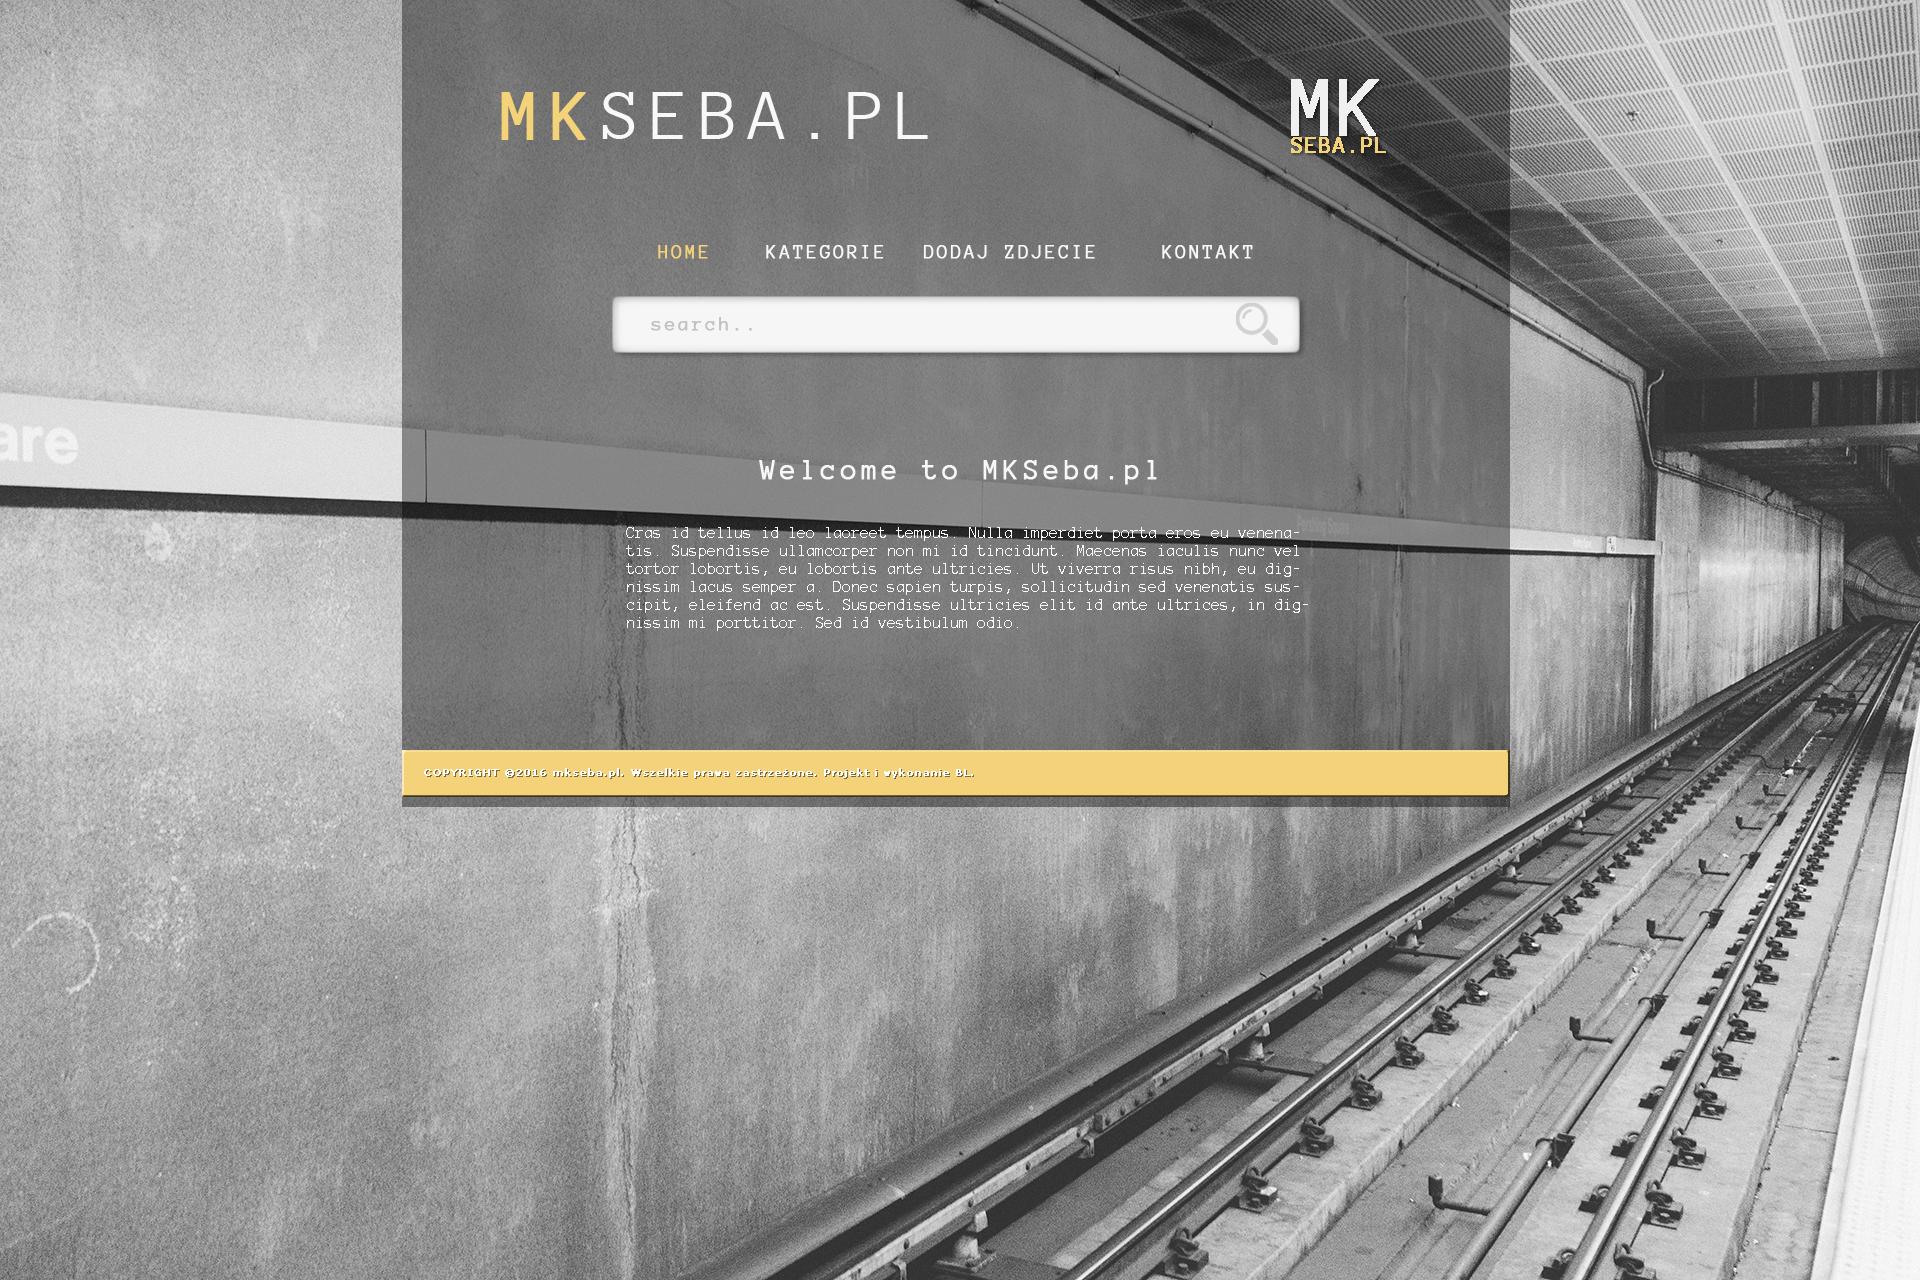 mkseba.pl #2